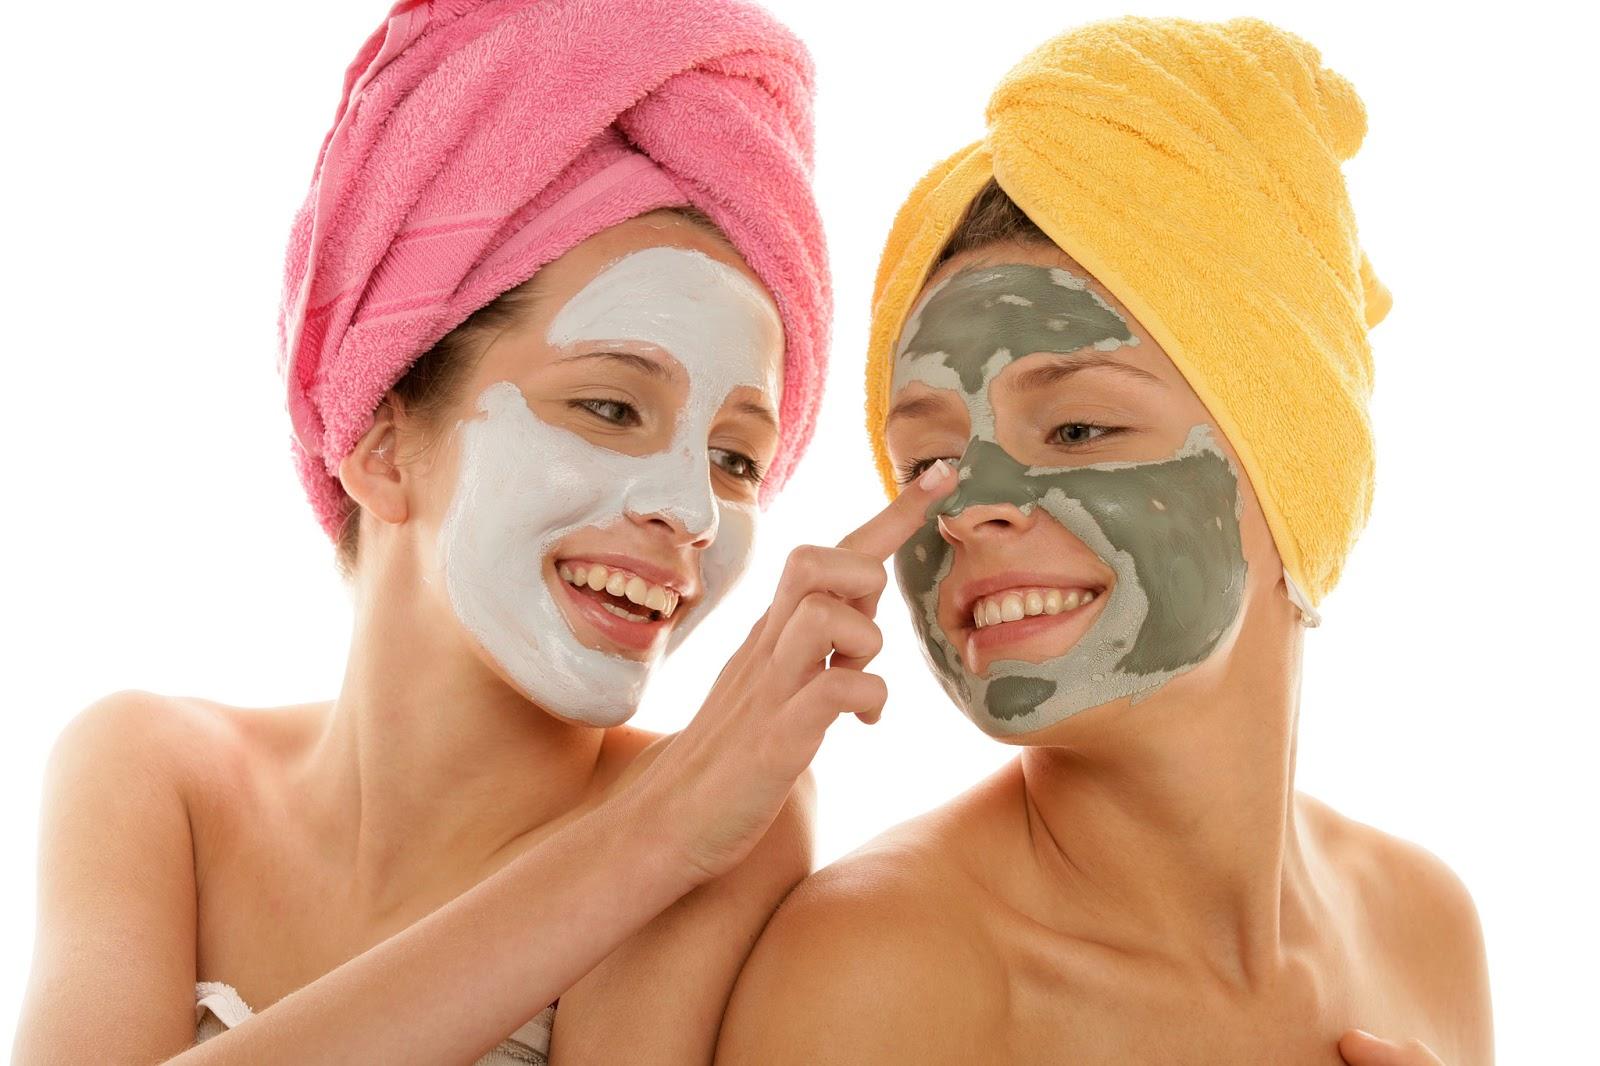 Домашние маски против воспалений на лице в домашних условиях